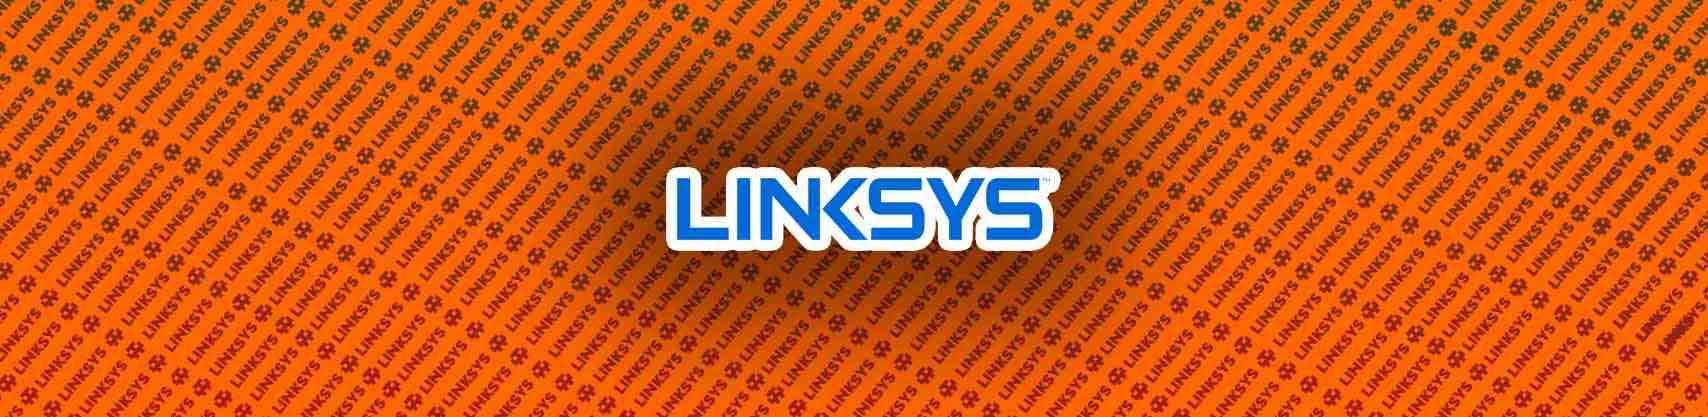 Linksys E4200 Manual